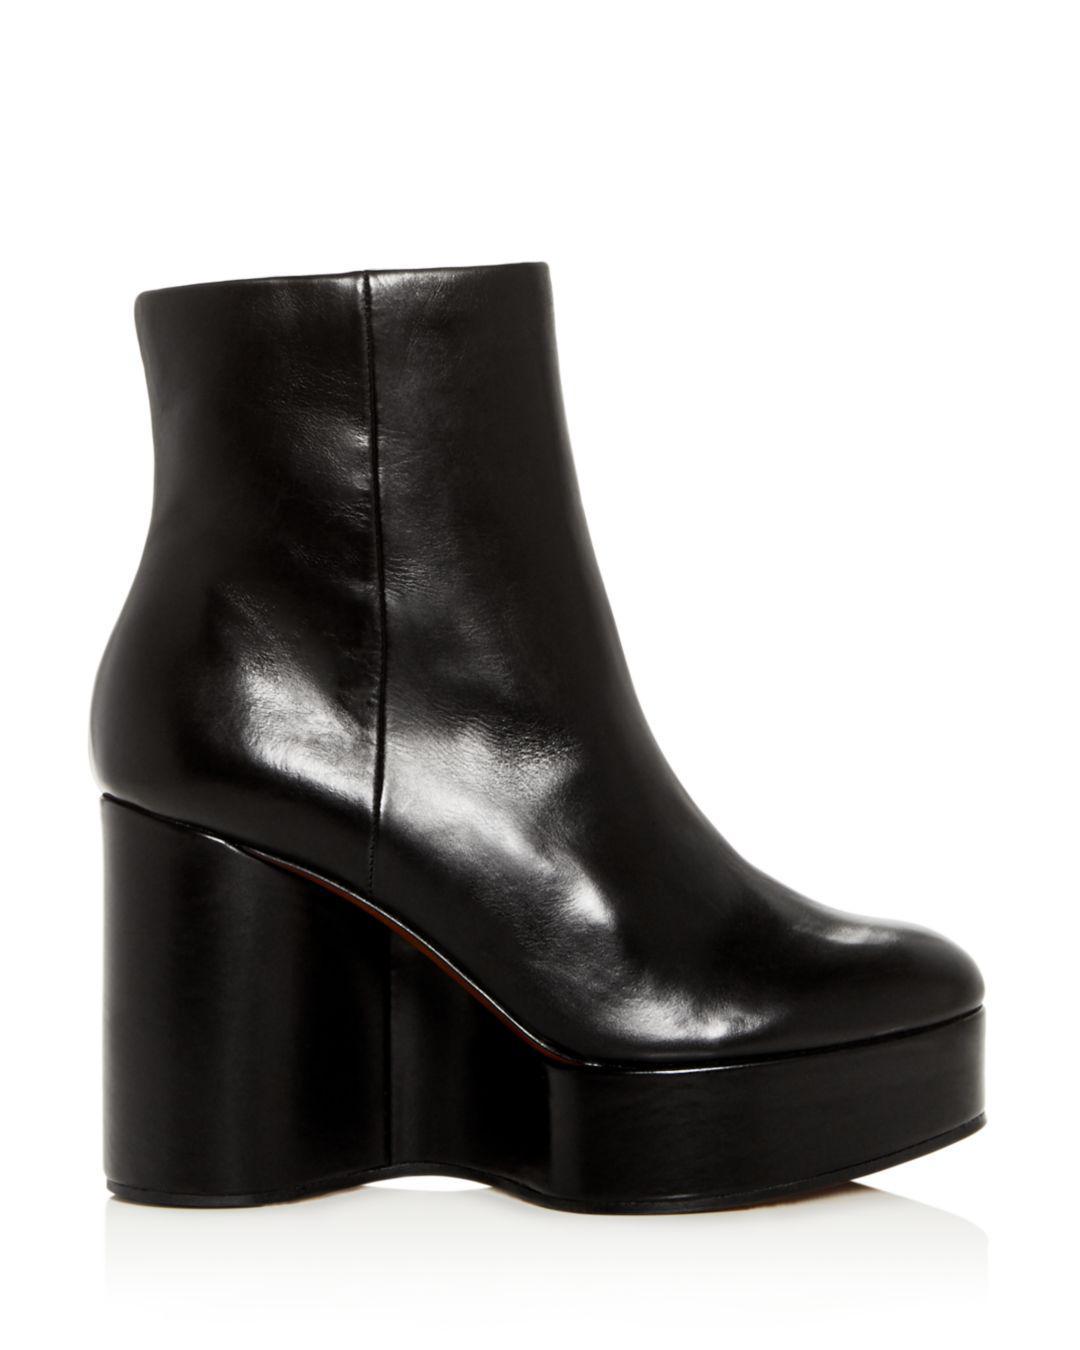 b33d2add8f8 Lyst - Clergerie Robert Women s Belen Leather Platform Wedge Booties in  Black